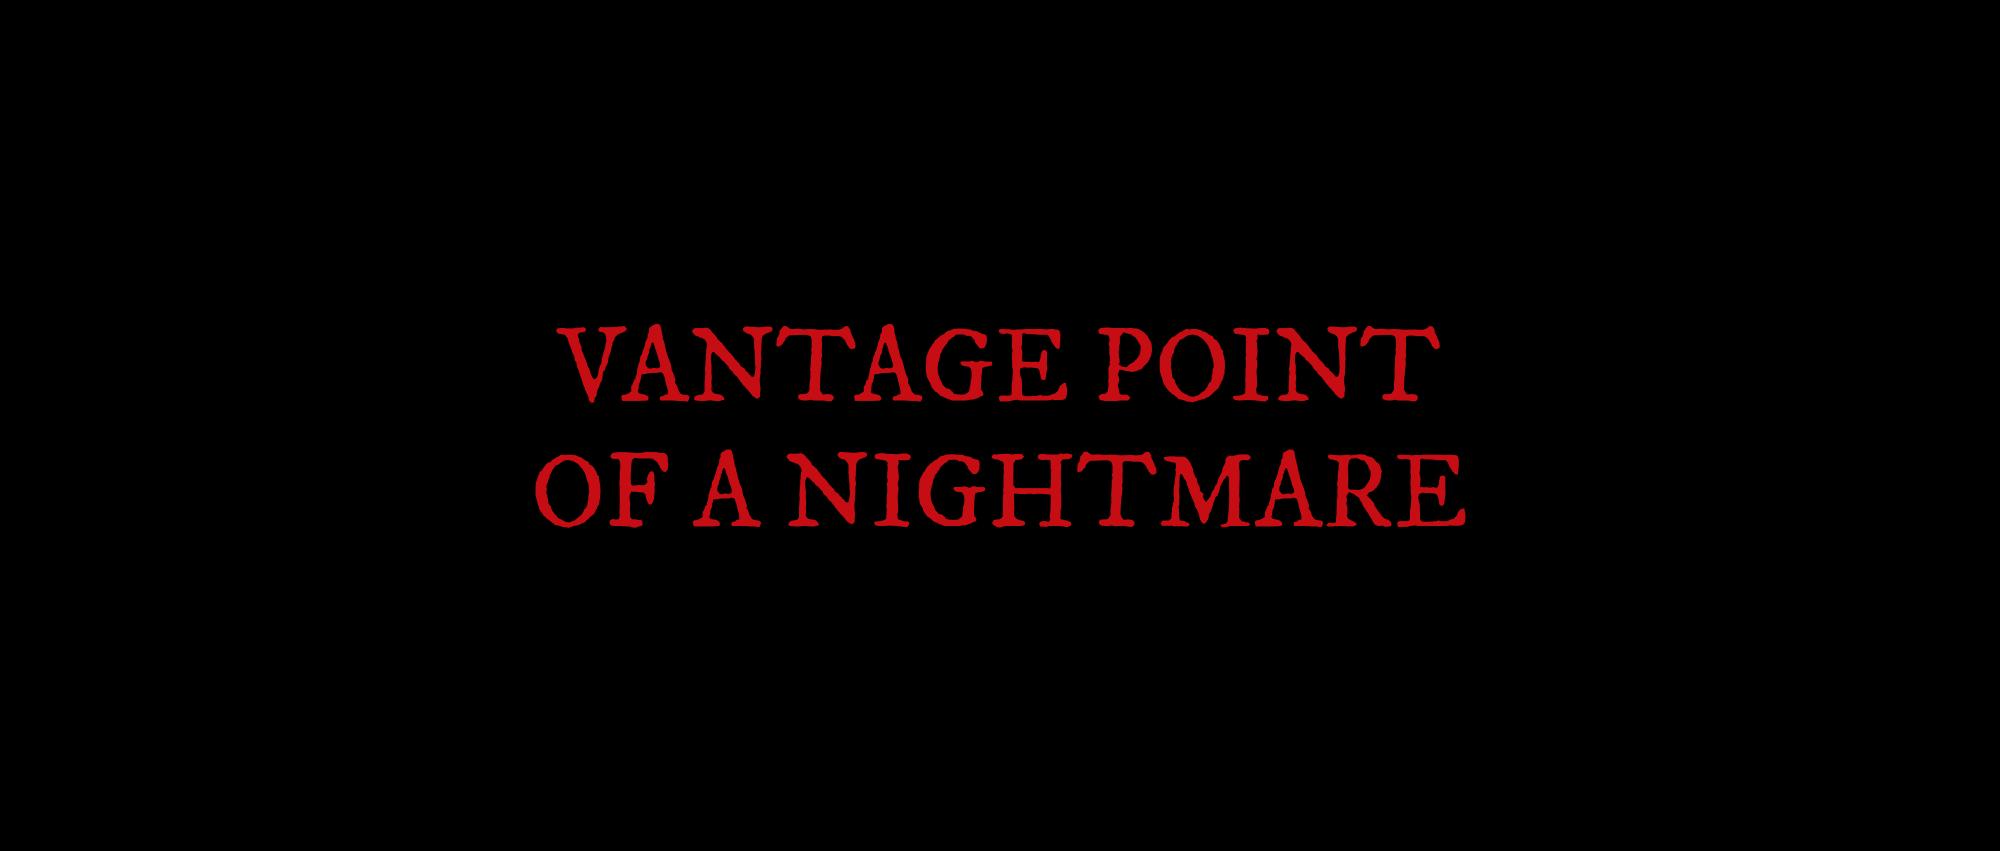 vantage%20point.png